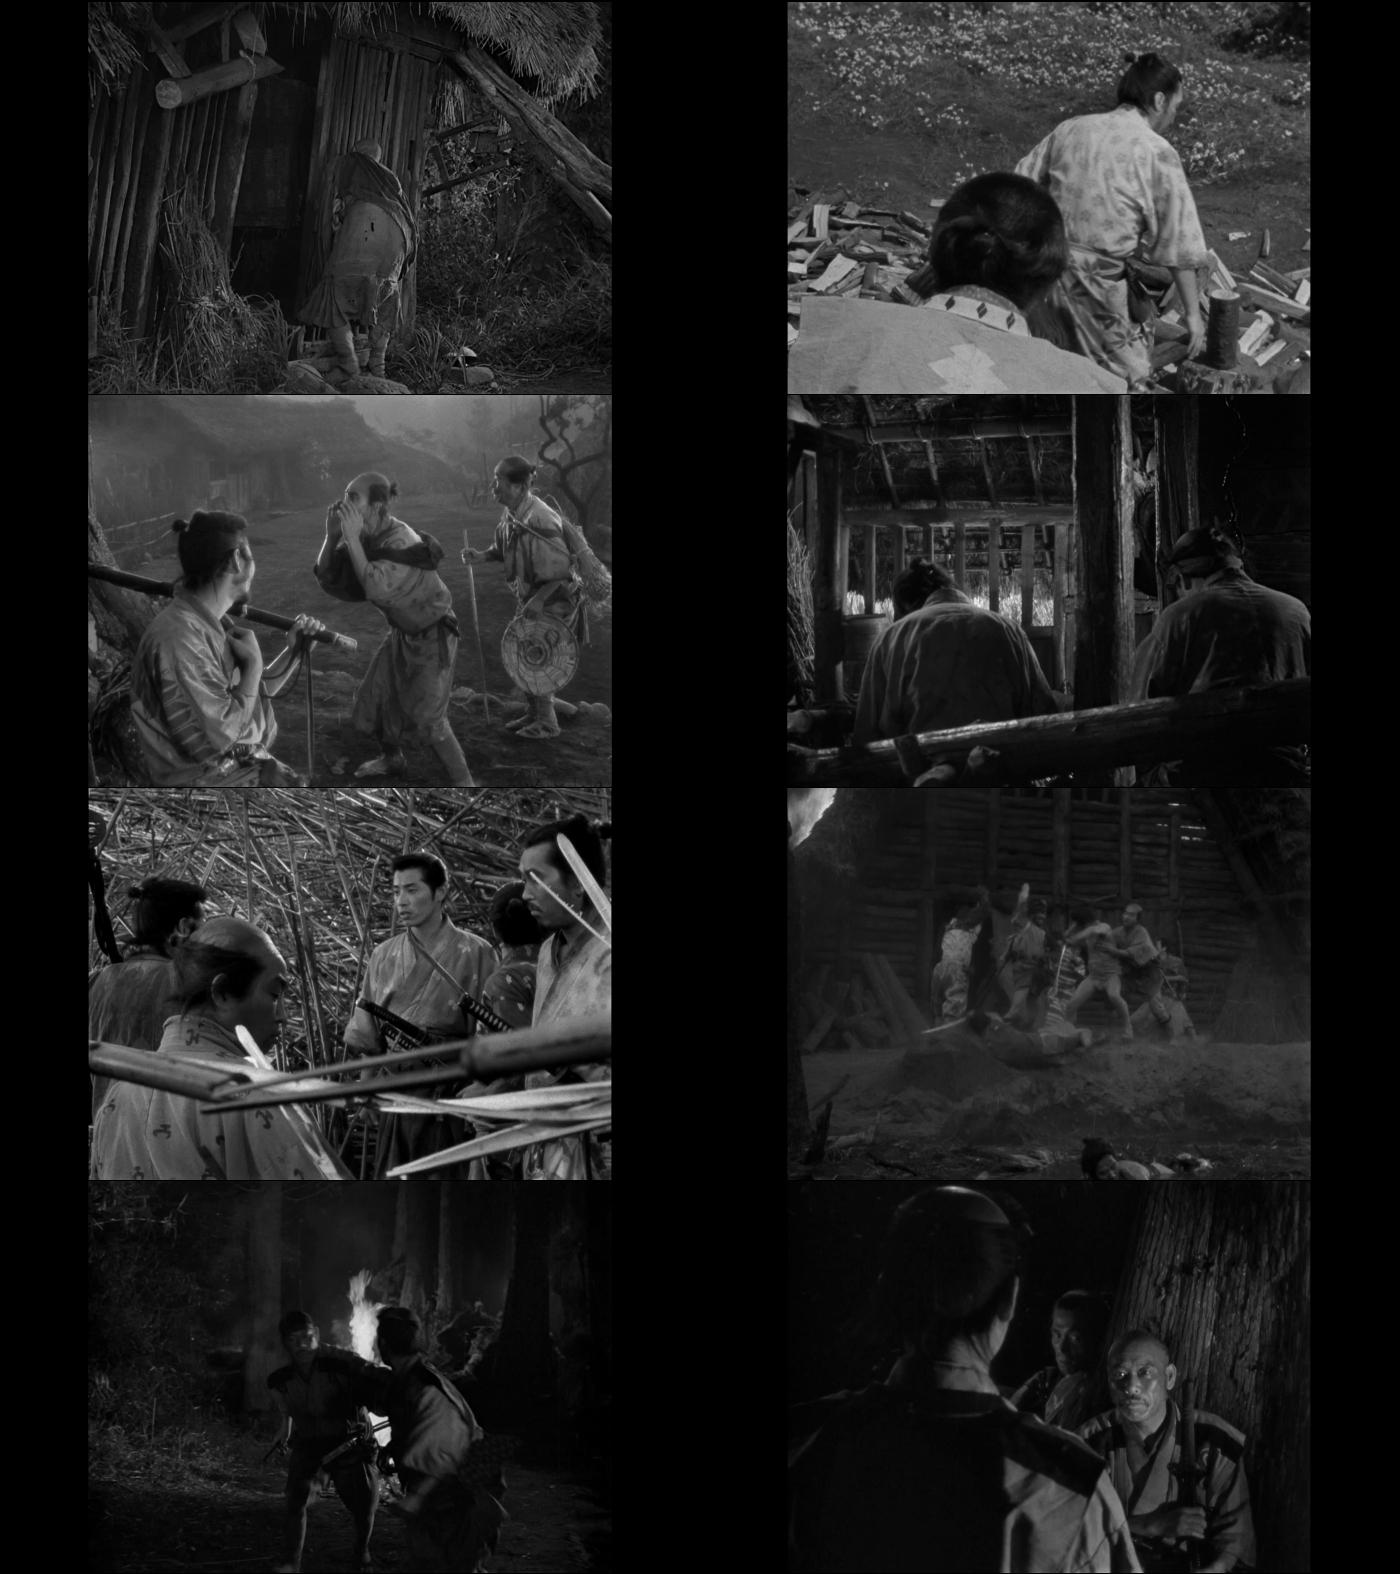 Los siete samurais 1080p